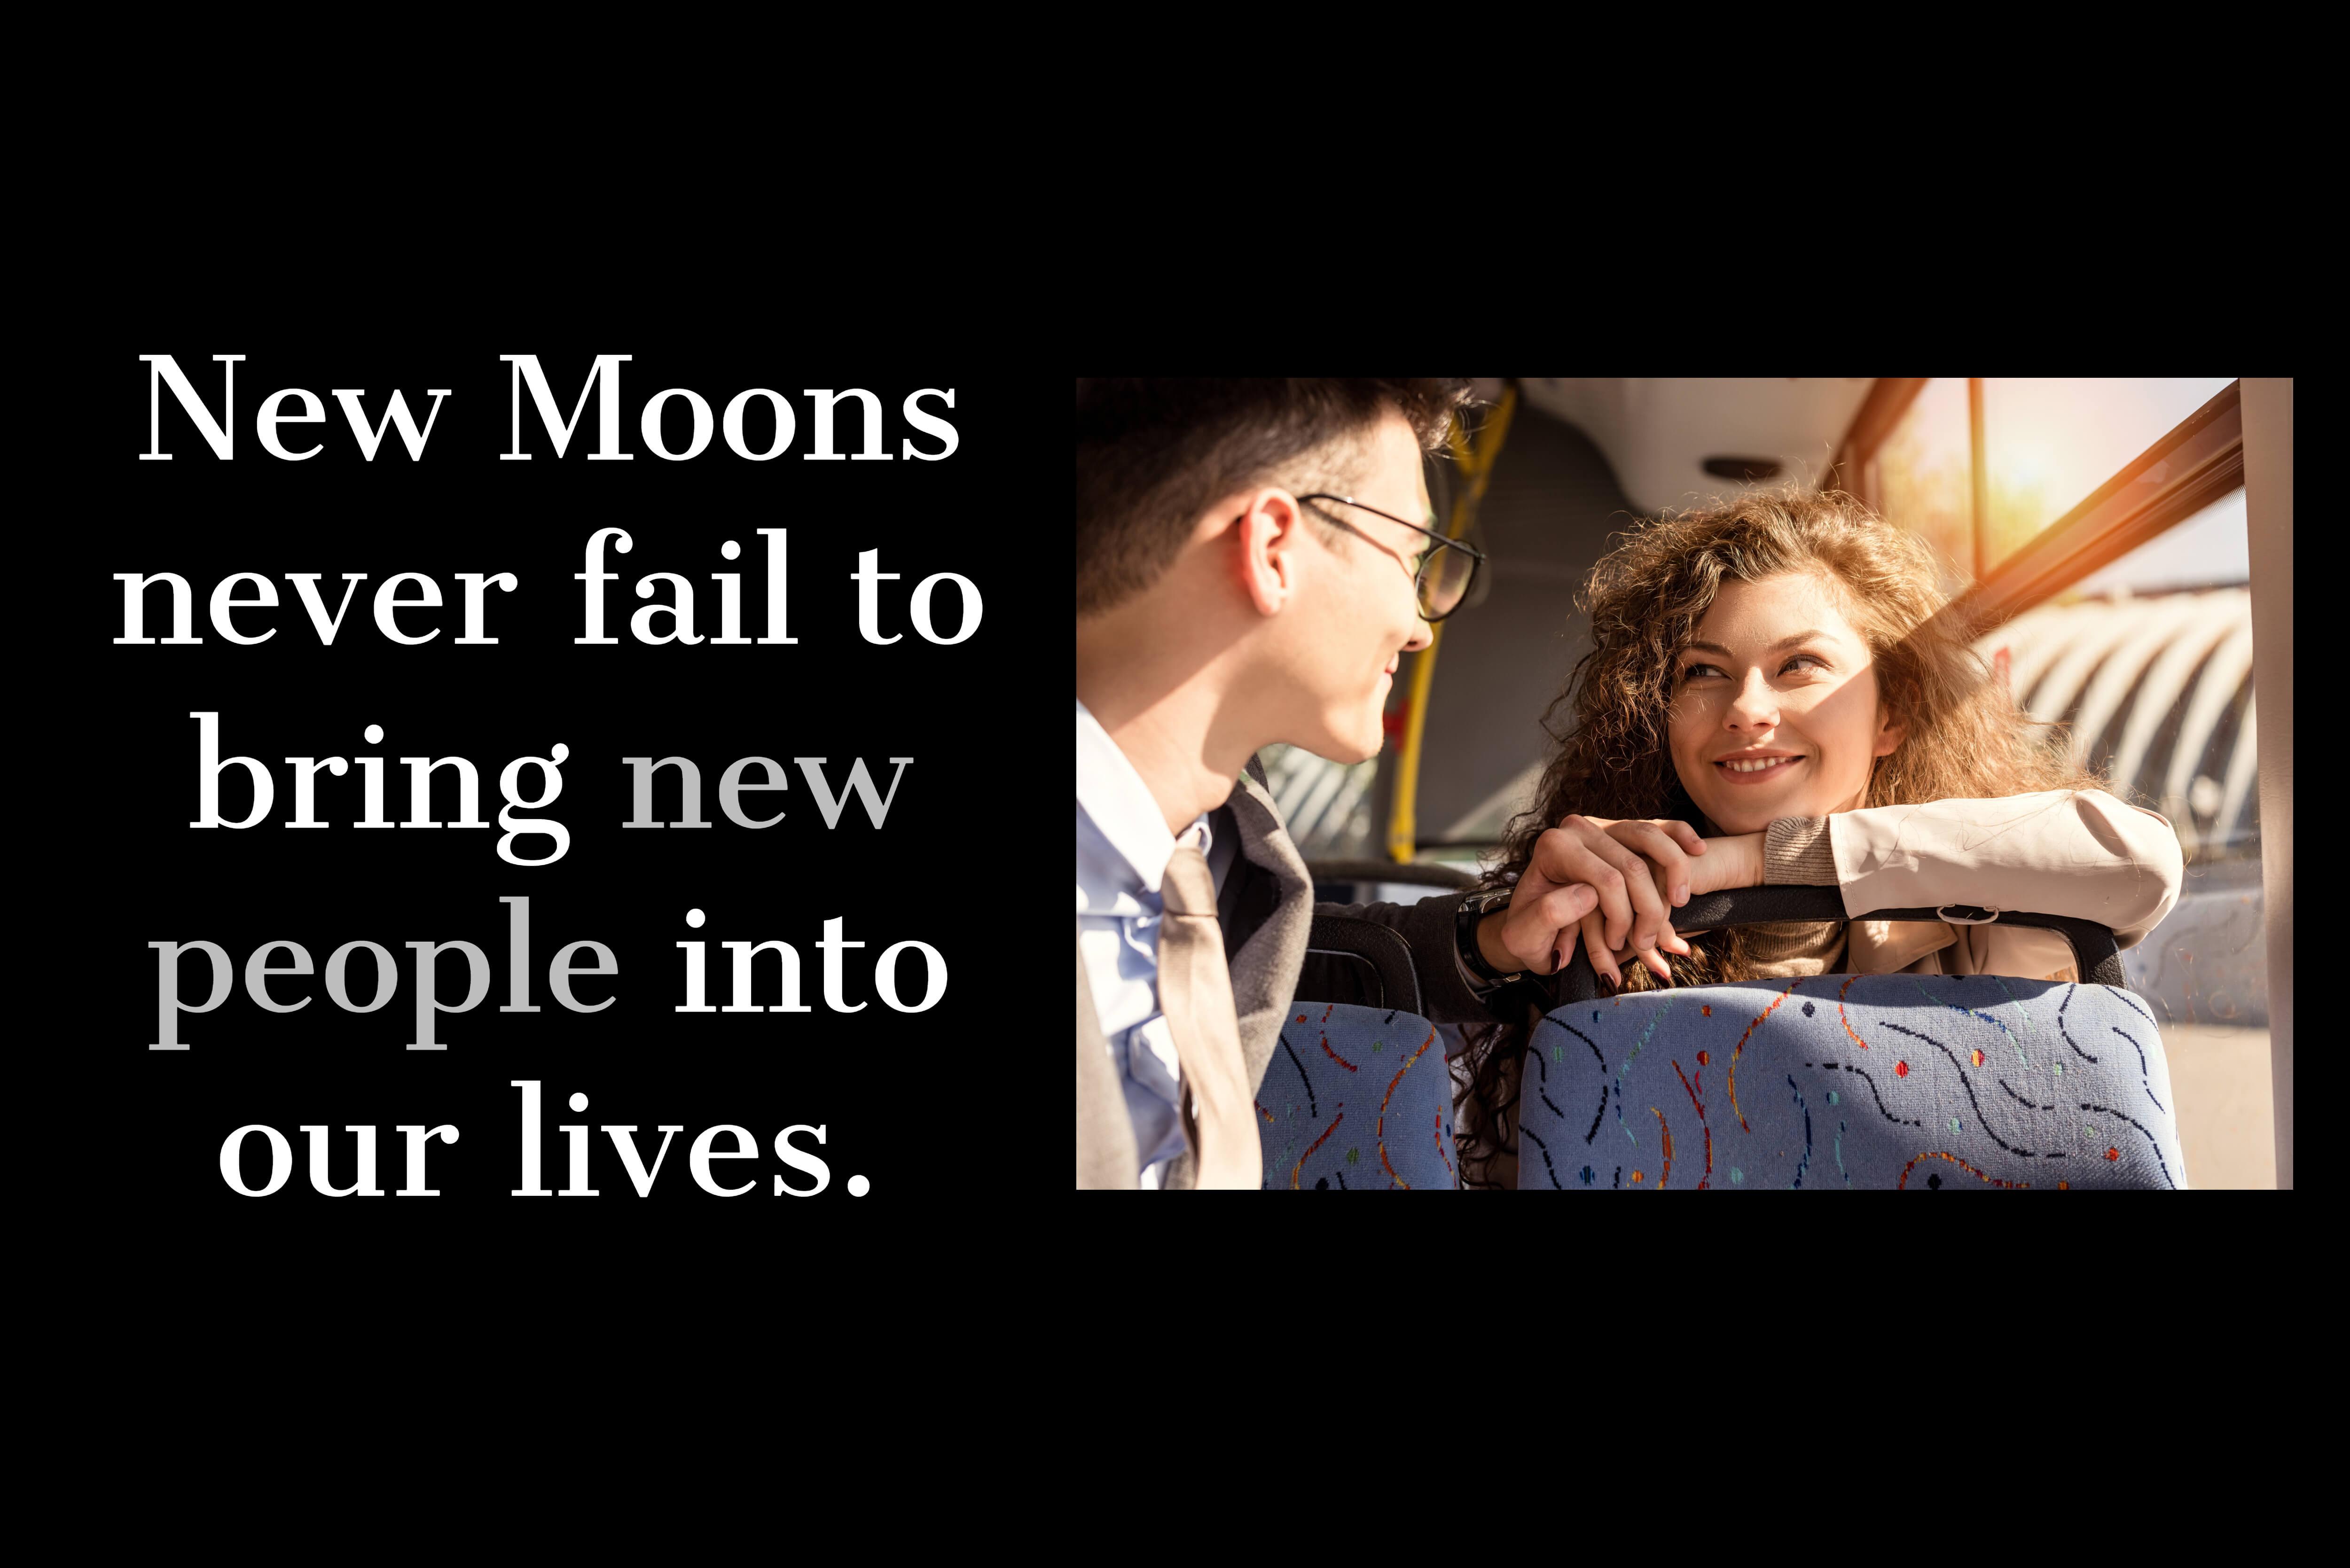 new moons